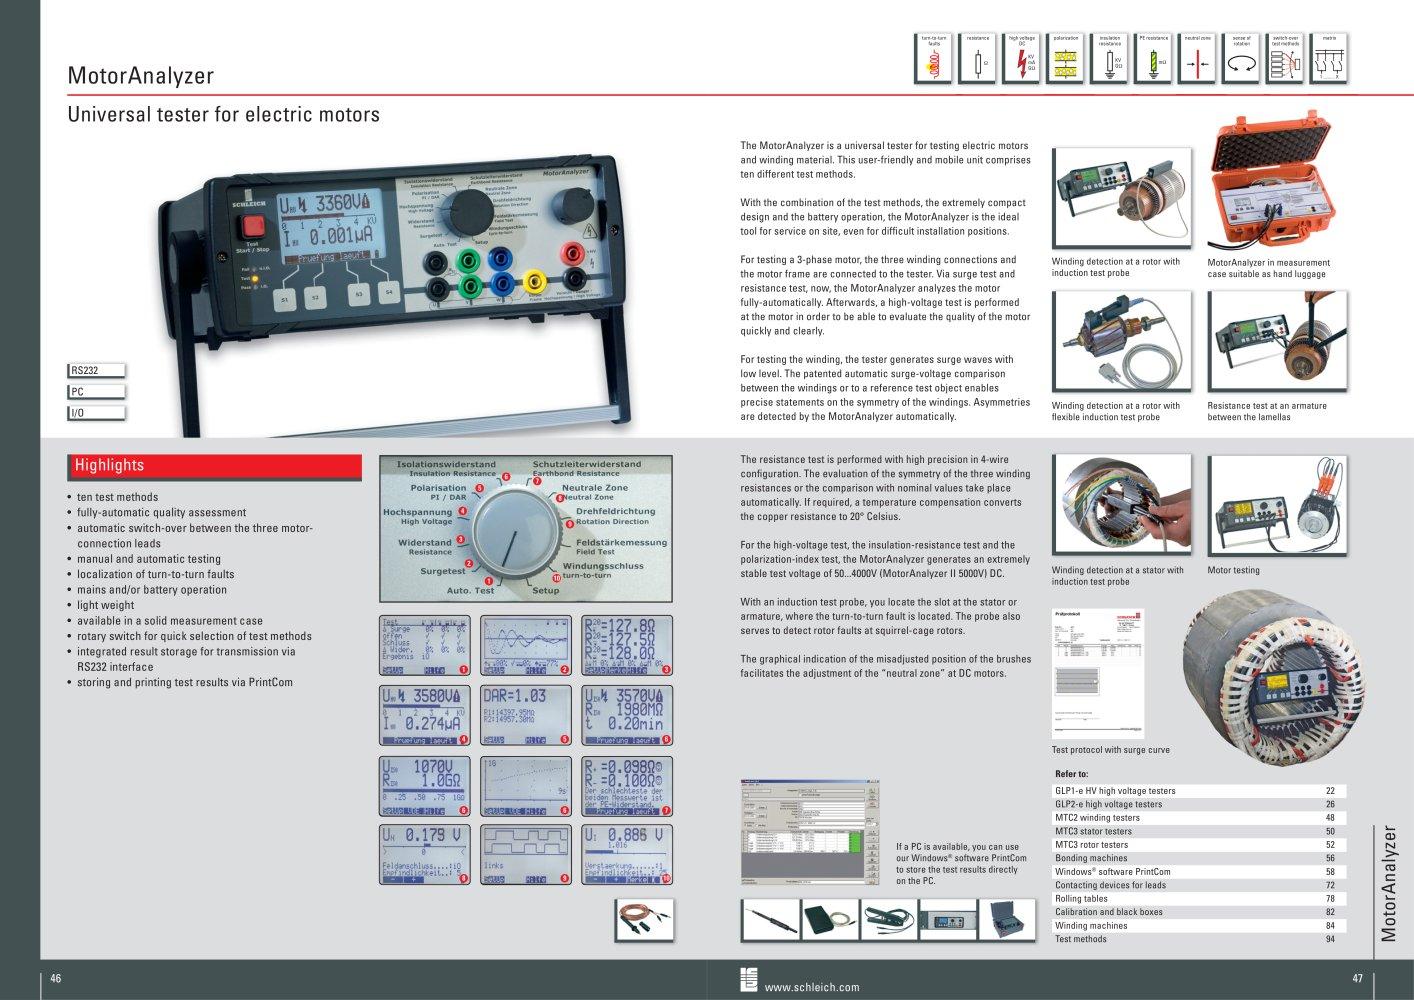 MotorAnalyzer | Universal motor analyzer [R + HV + Iso + Surge +++ ...